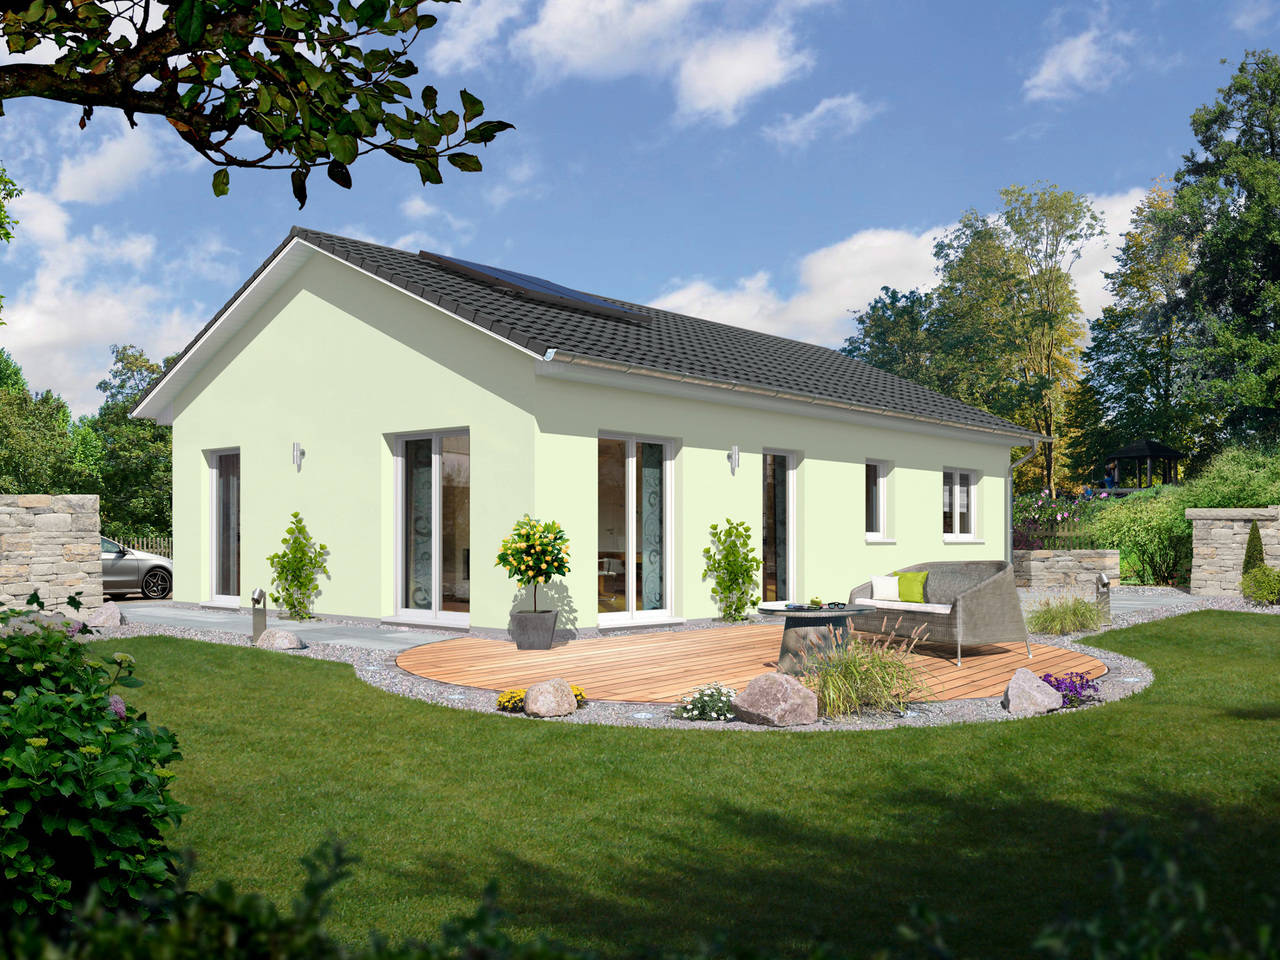 Bungalow 100 trend A2 von FIMA Hausbau